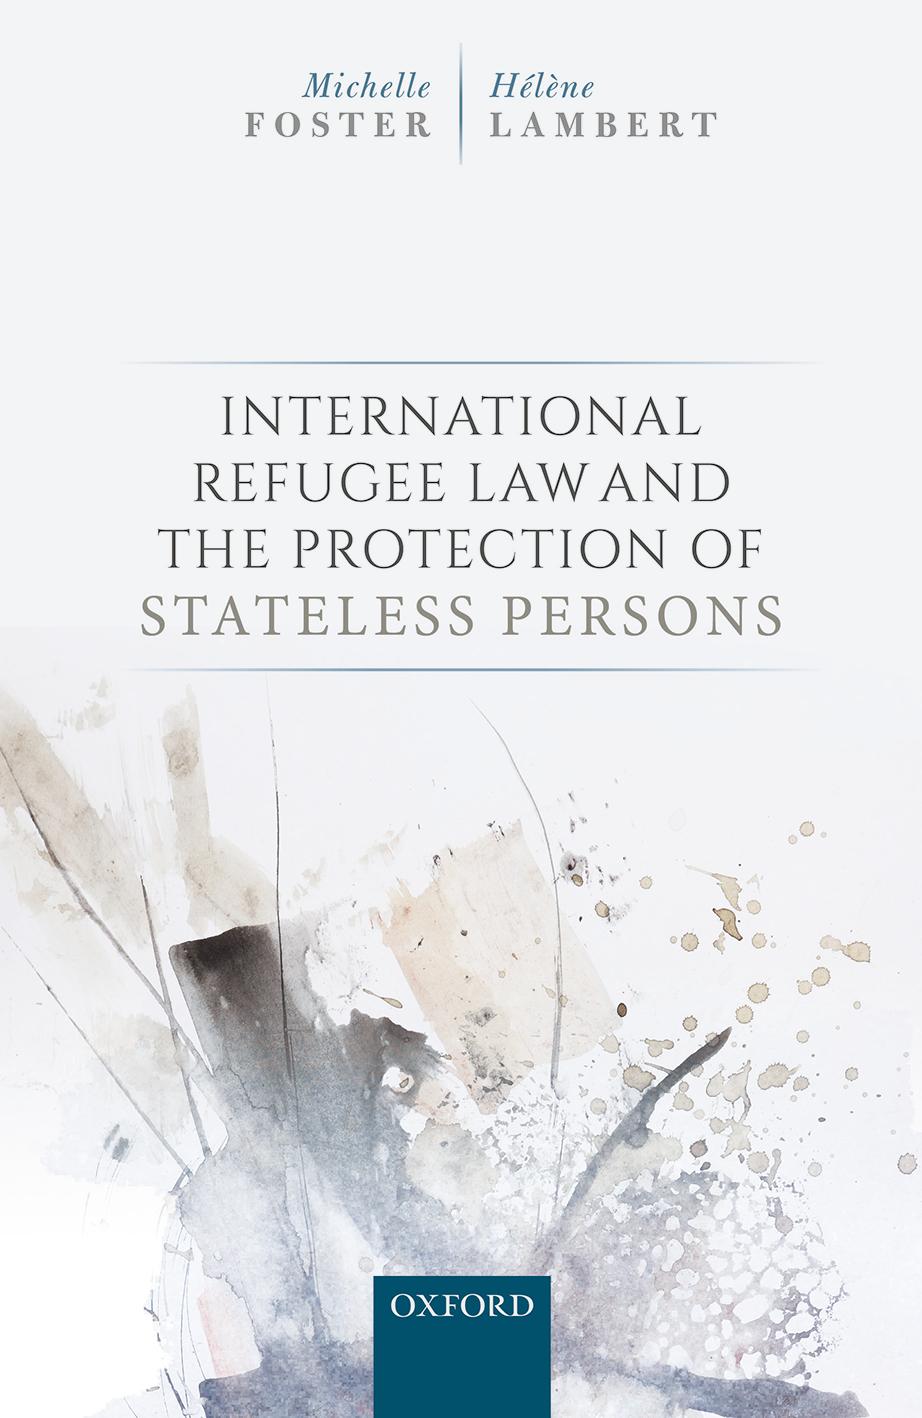 Oxford Public International Law: World Refugee Day Resources